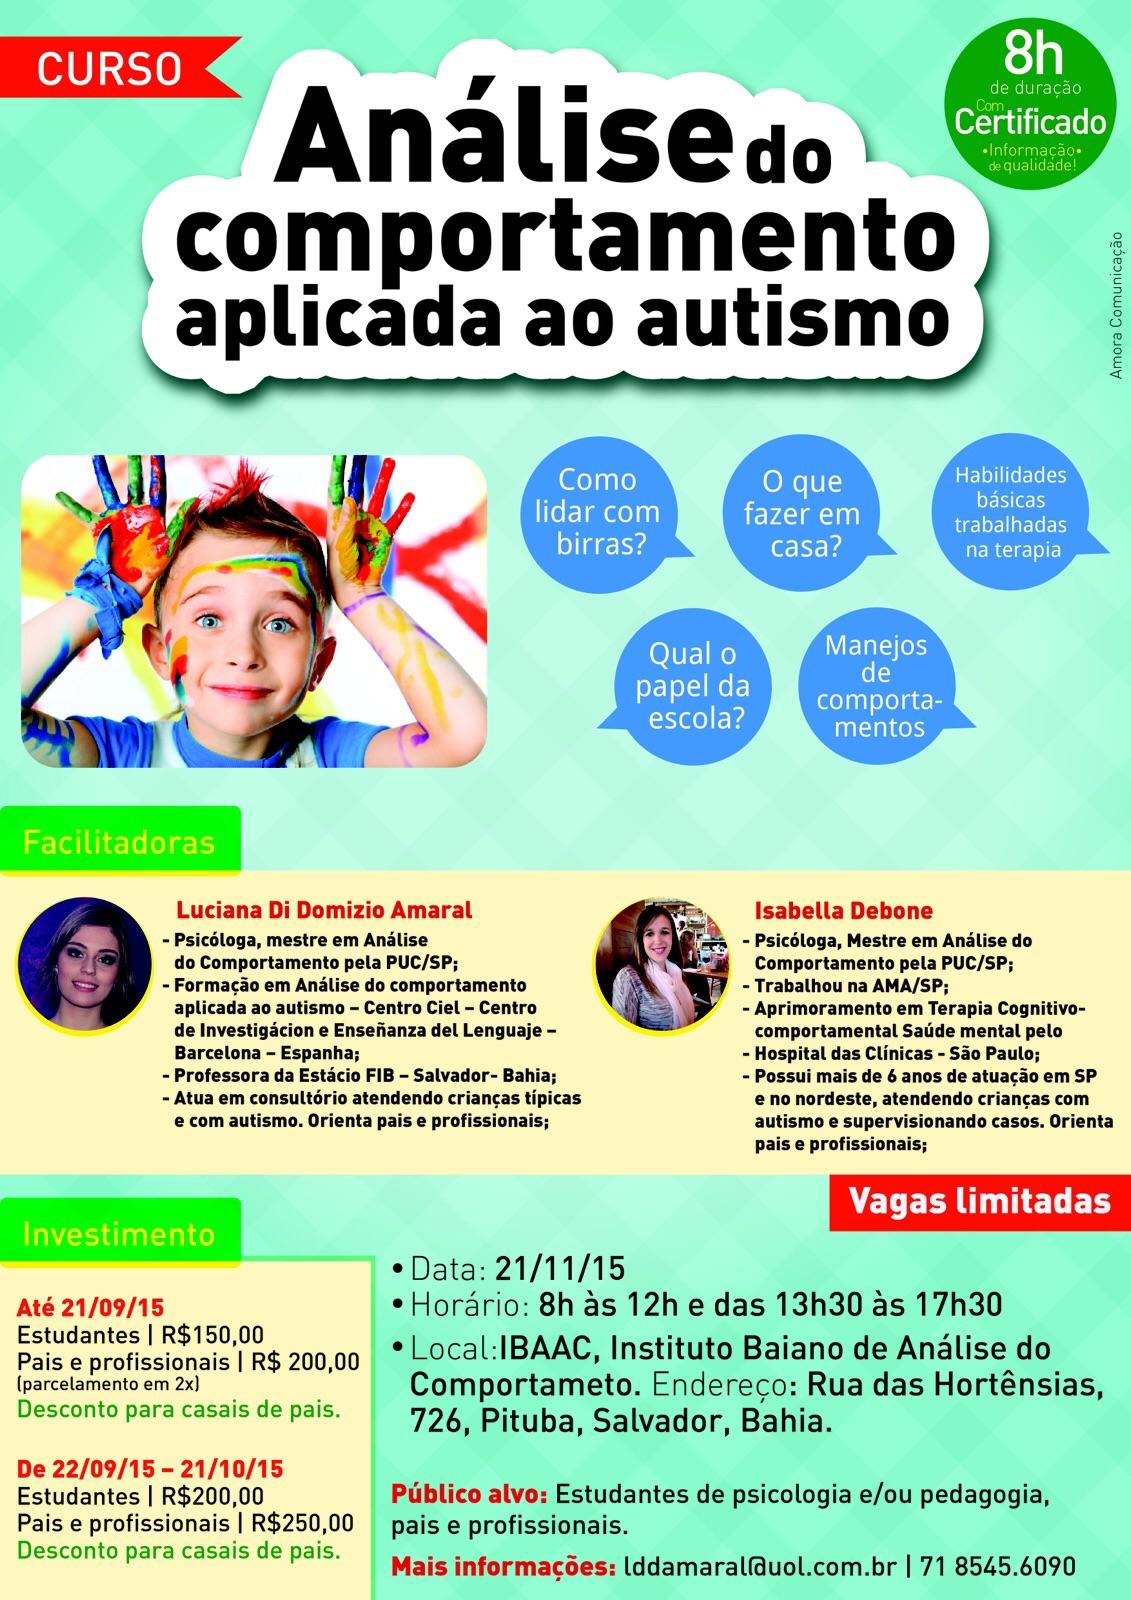 3 Bedroom Houses For Rent In Columbia Sc Autismo Comportamento Setembro 2015 Psicologia Bahia